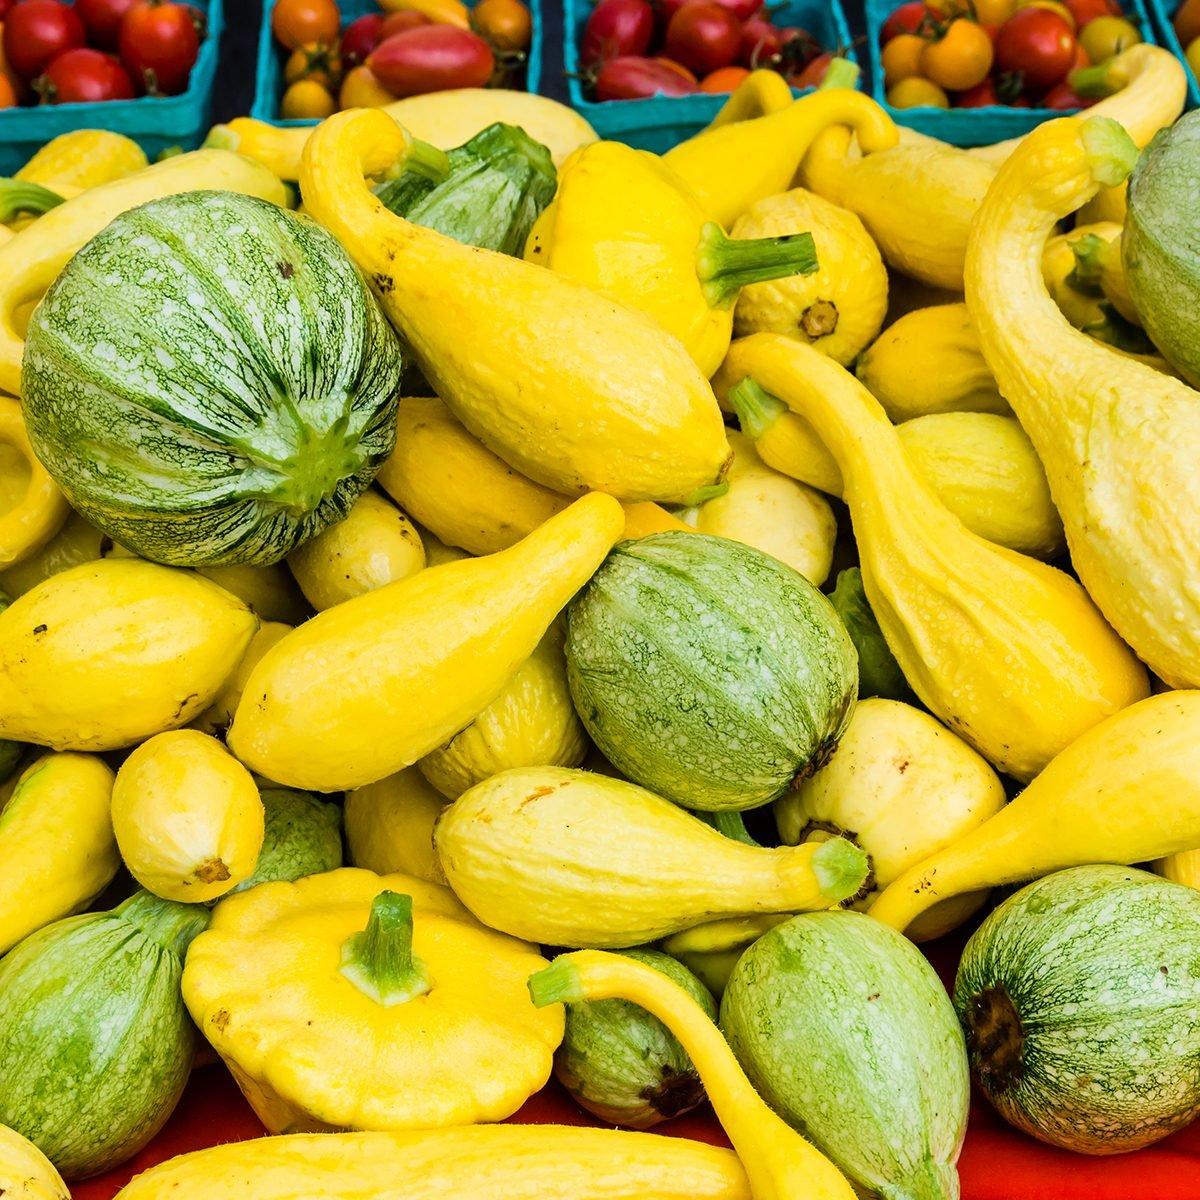 Squash summer squash on display at the farmers market